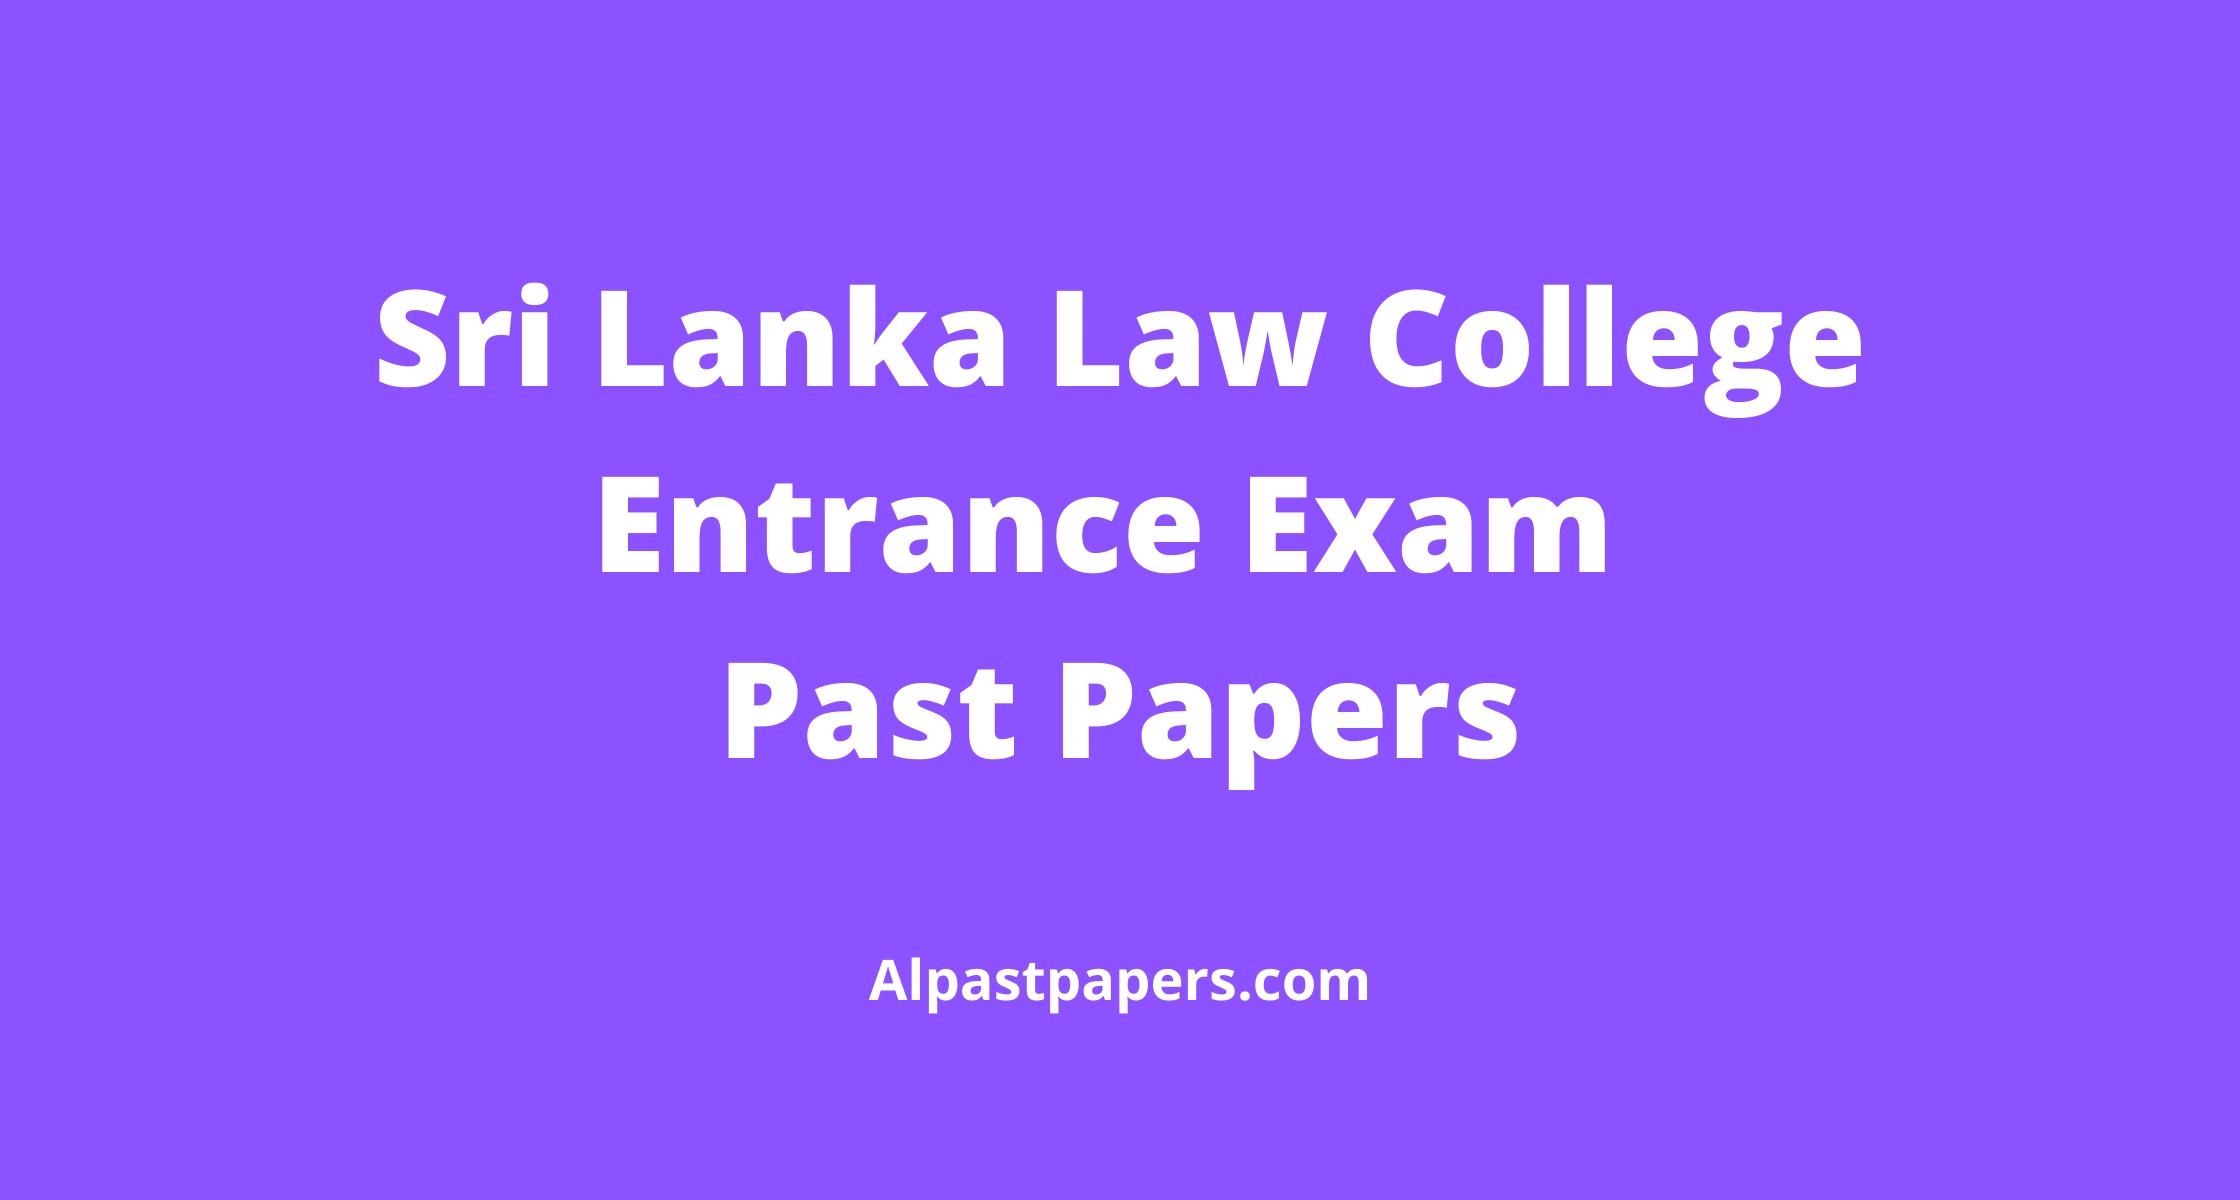 Sri lanka Law College Entrance exam past paper